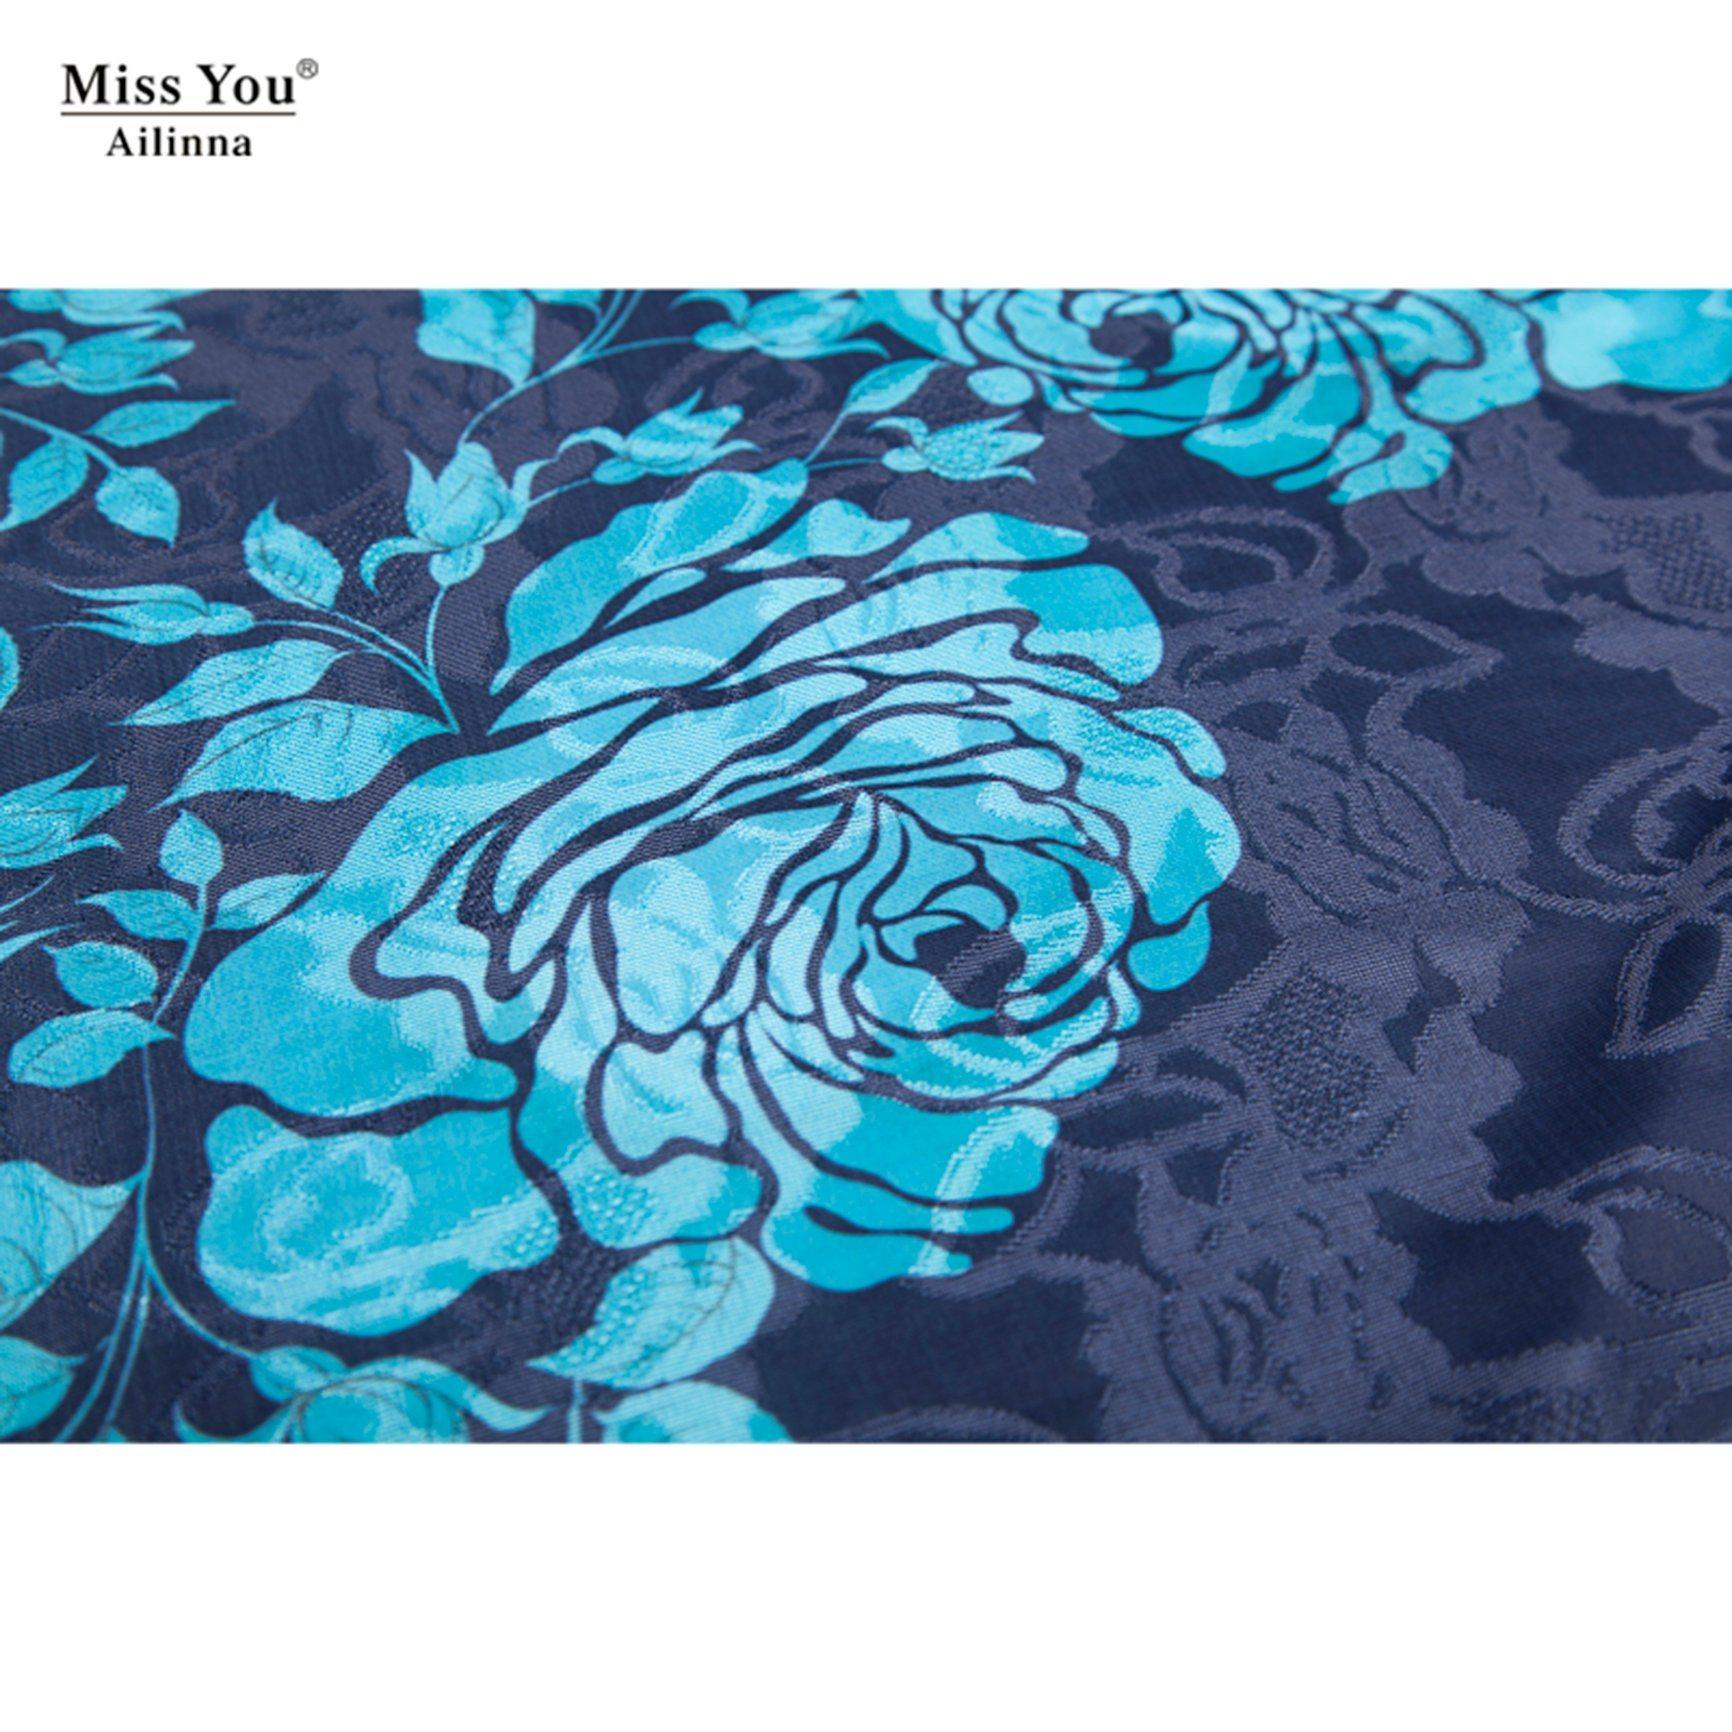 Miss You Ailinna 304707 Low Price Jacquard Cotton Dress Distributor Long Beaded Floral Dress